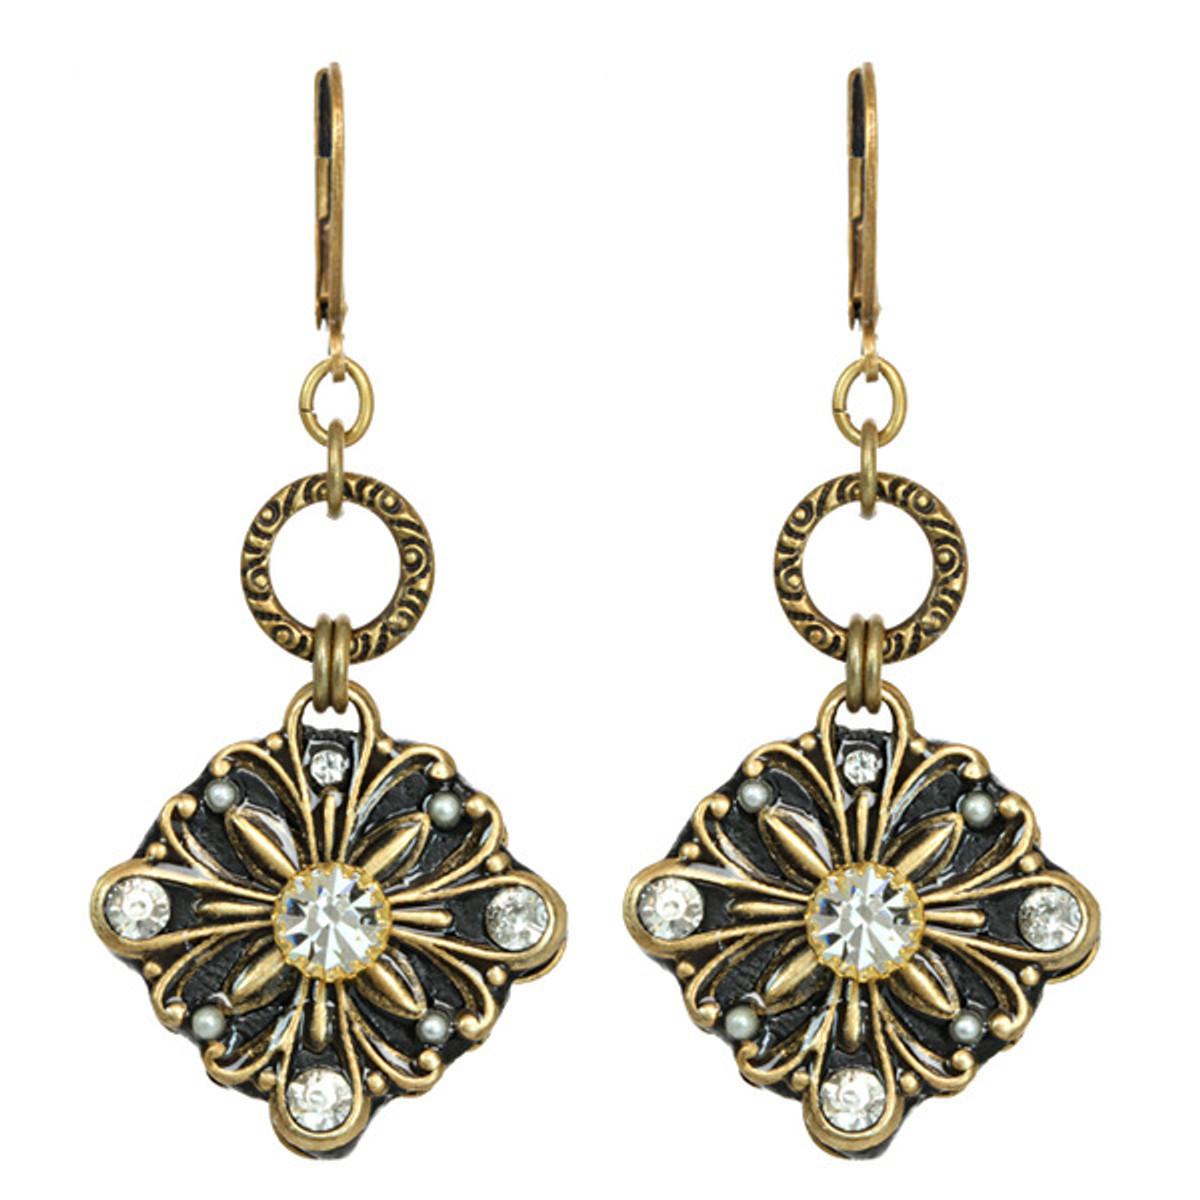 Golan Deco Earrings